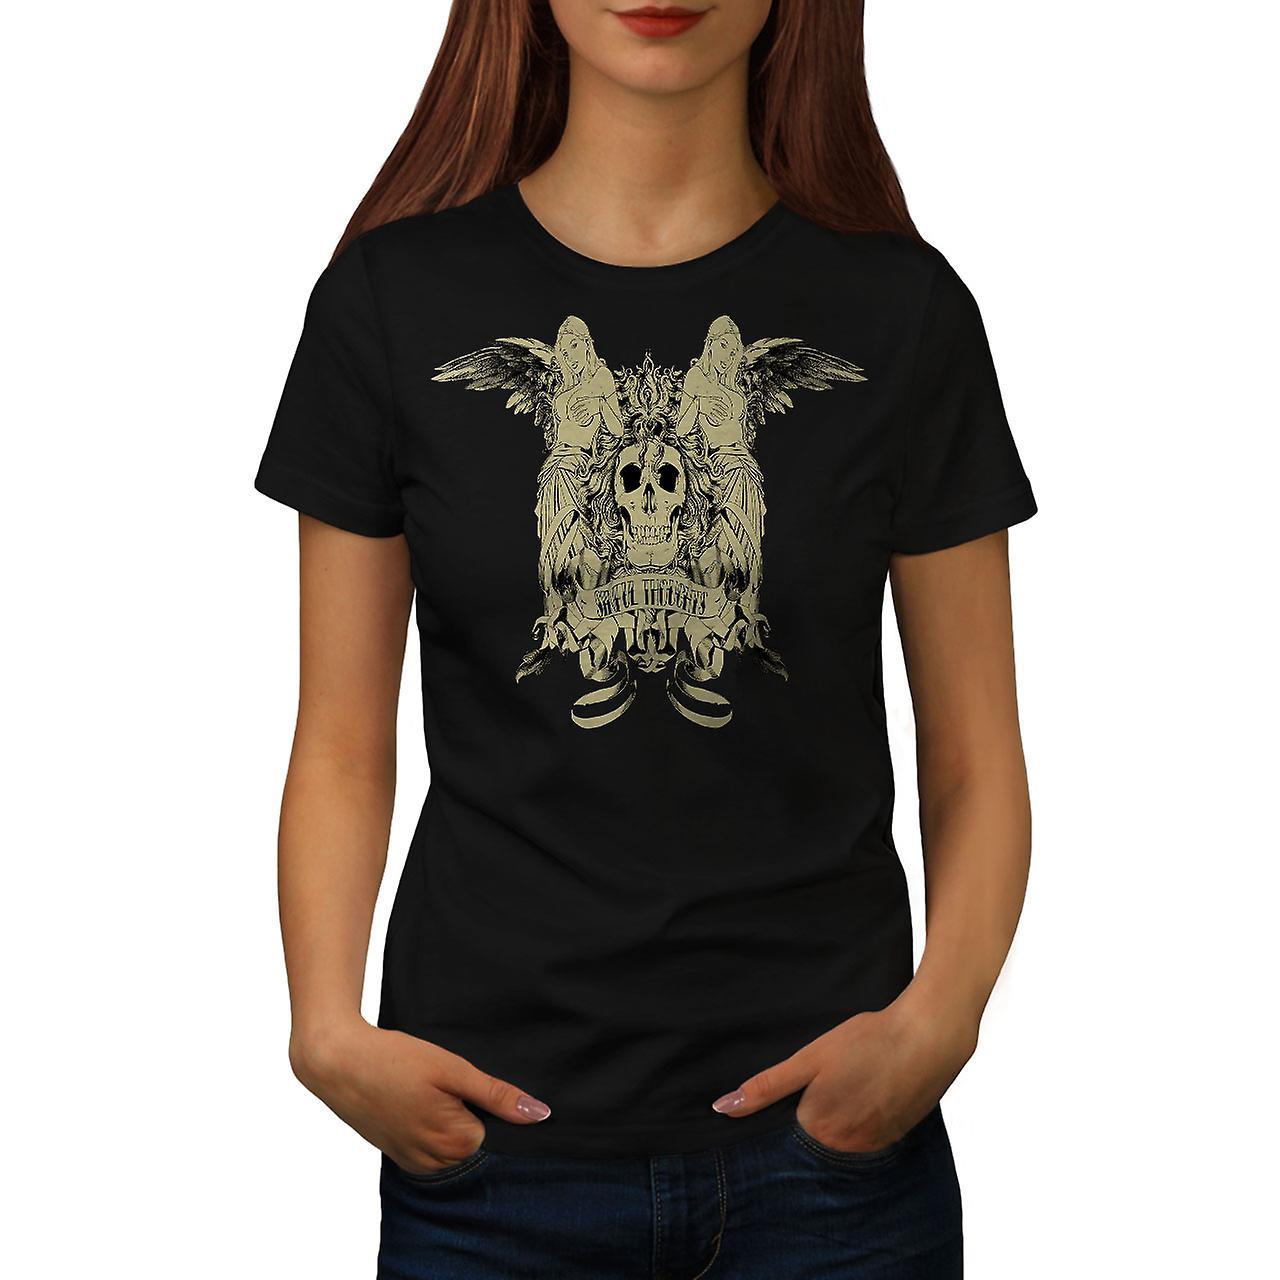 Sinful Thought Sexy Skull Women Black T-shirt | Wellcoda